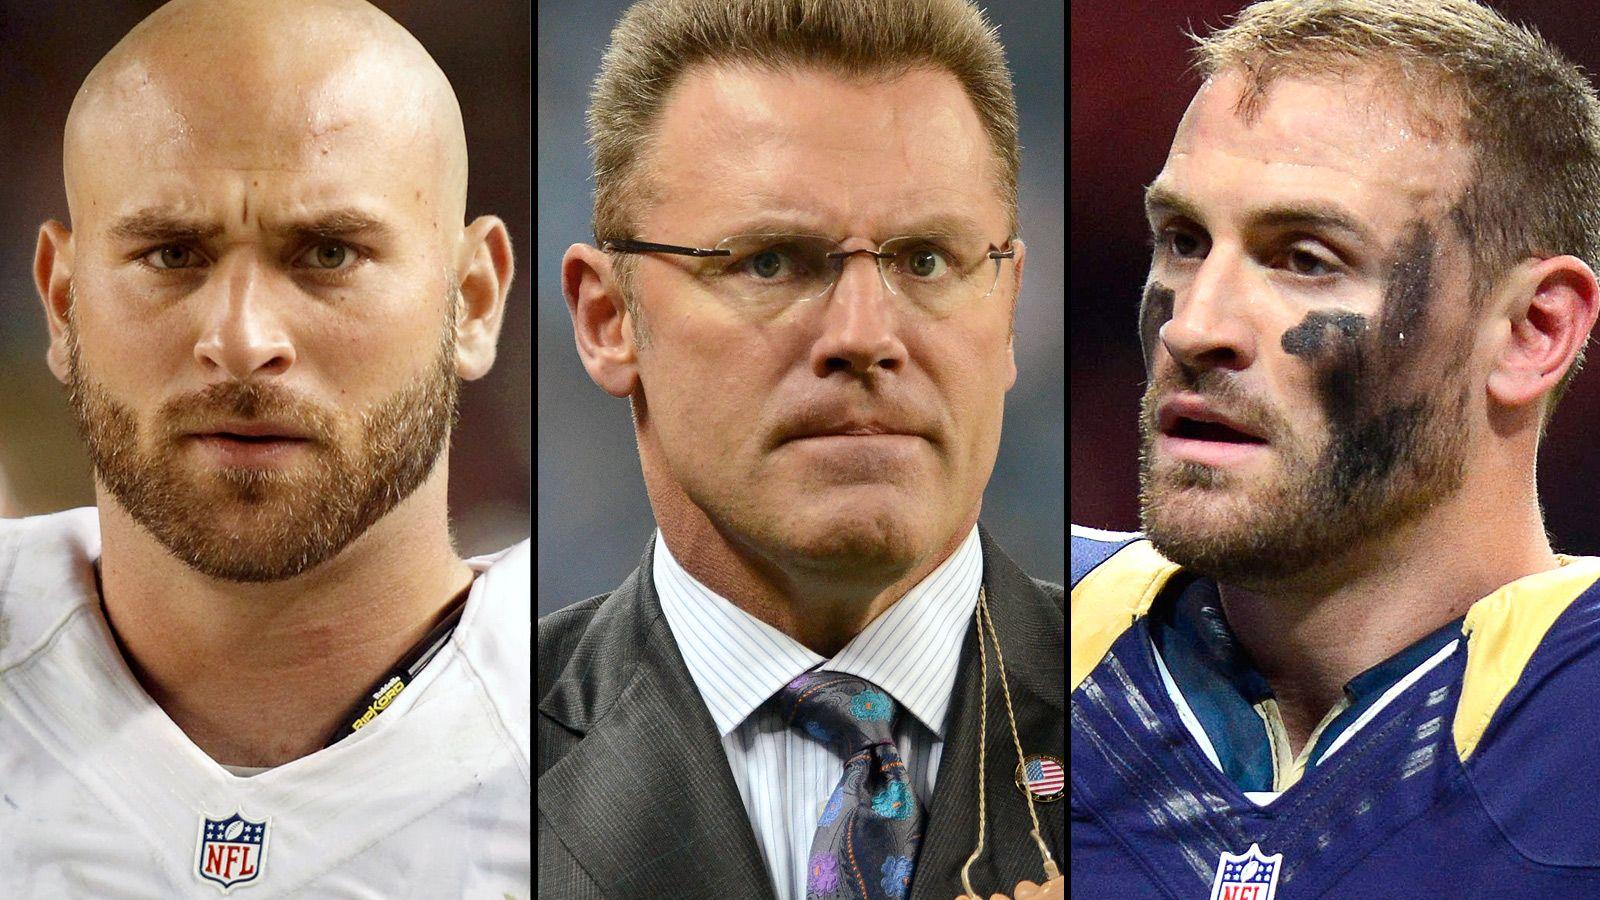 4. Howie, Chris, Kyle Long - Estimated Net Worth: $22 Million